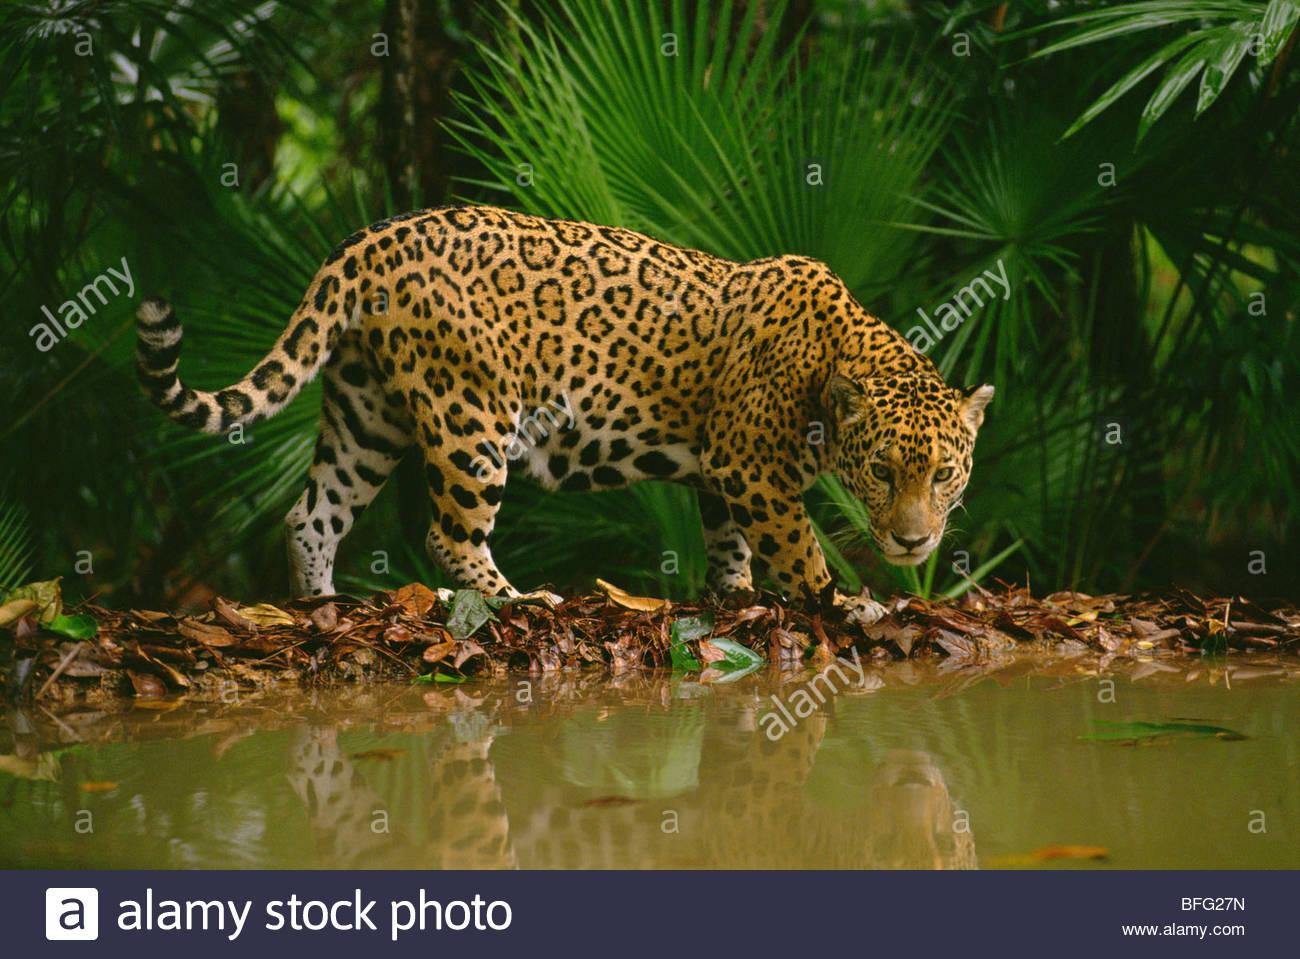 Jaguar am Wasserloch, Panthera Onca, Belize Stockbild